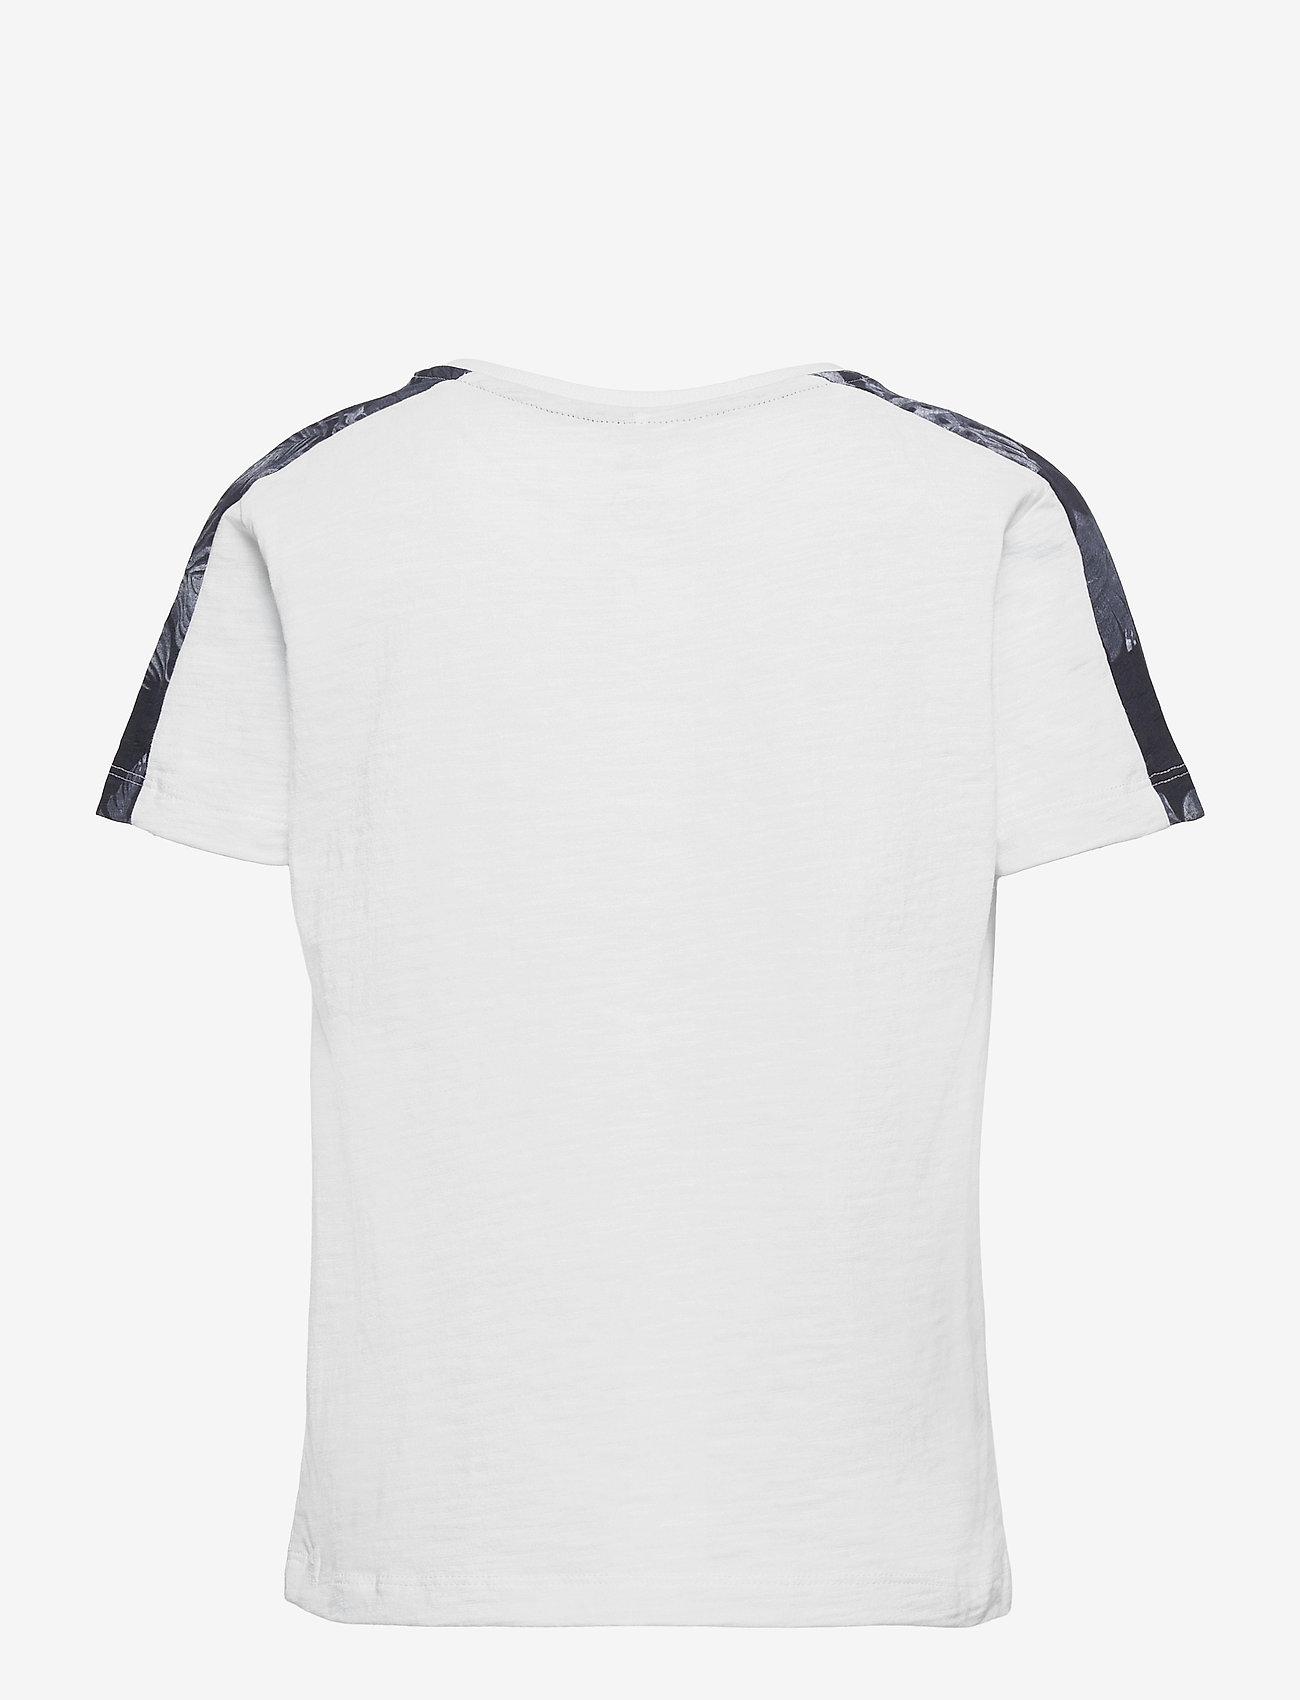 name it - NKMHAILOM SS TOP - t-shirts - bright white - 1